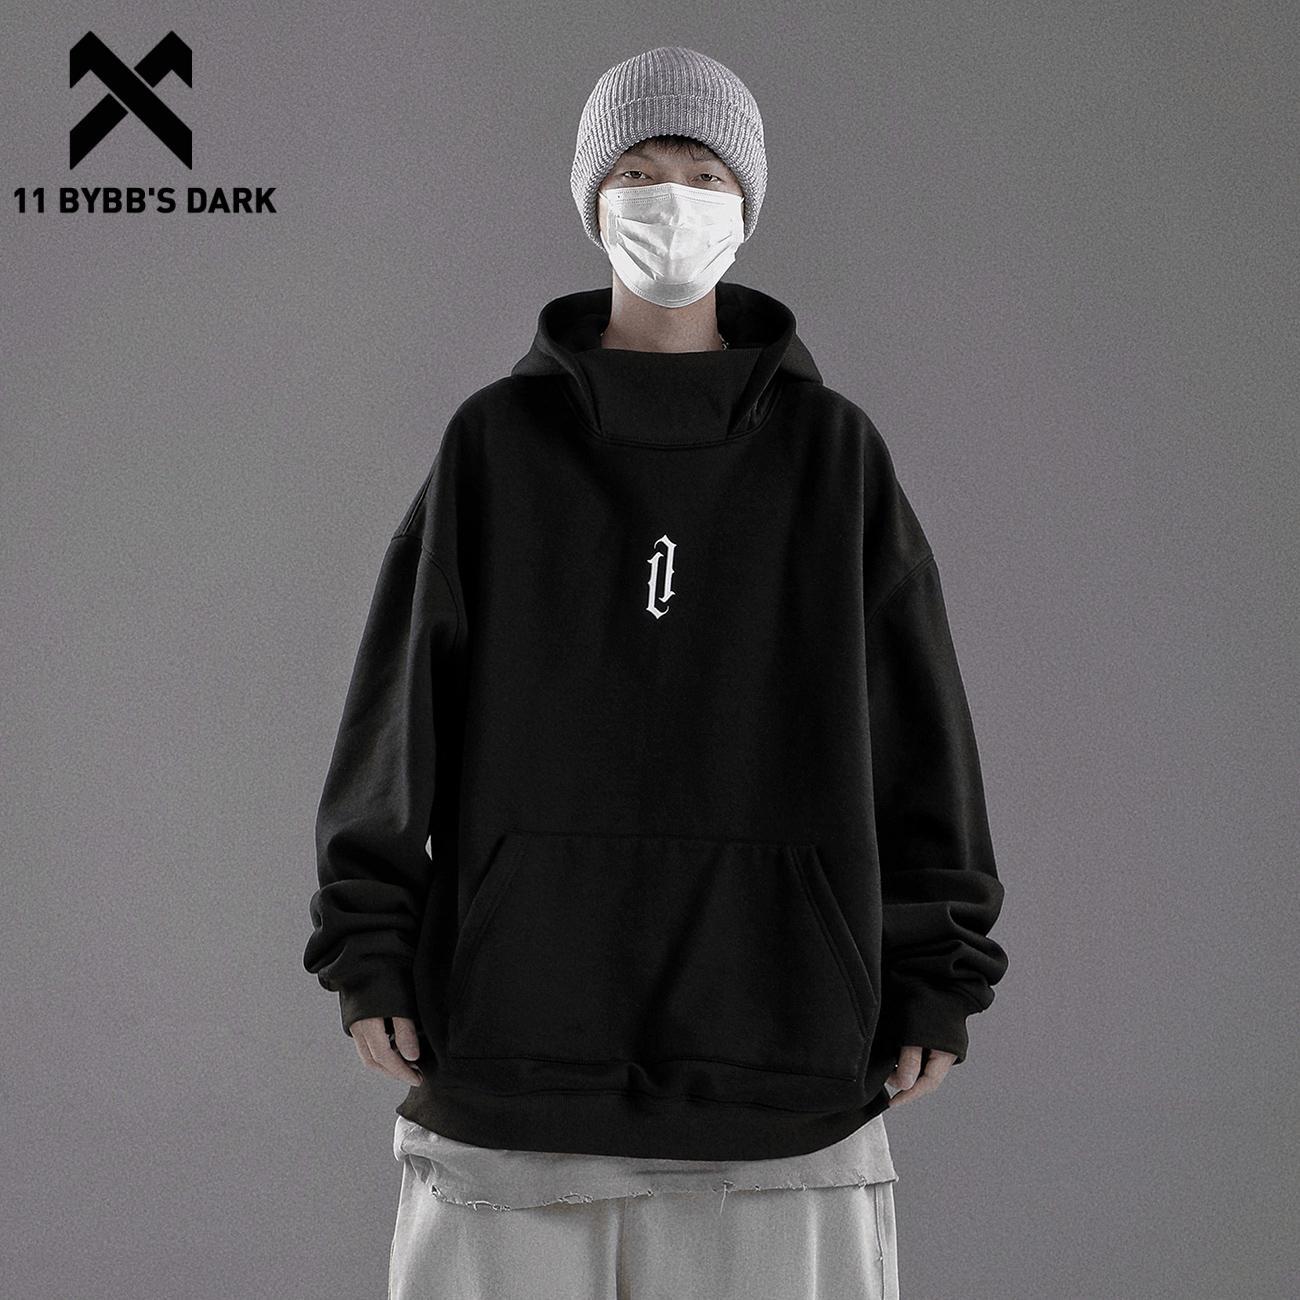 11 BYBB'S الظلام الصلبة هوديي بلوزات النينجا عالية الياقة كنزة صوف القطن Techwear Harajuku الرجال هوديي الهيب هوب الشارع الشهير